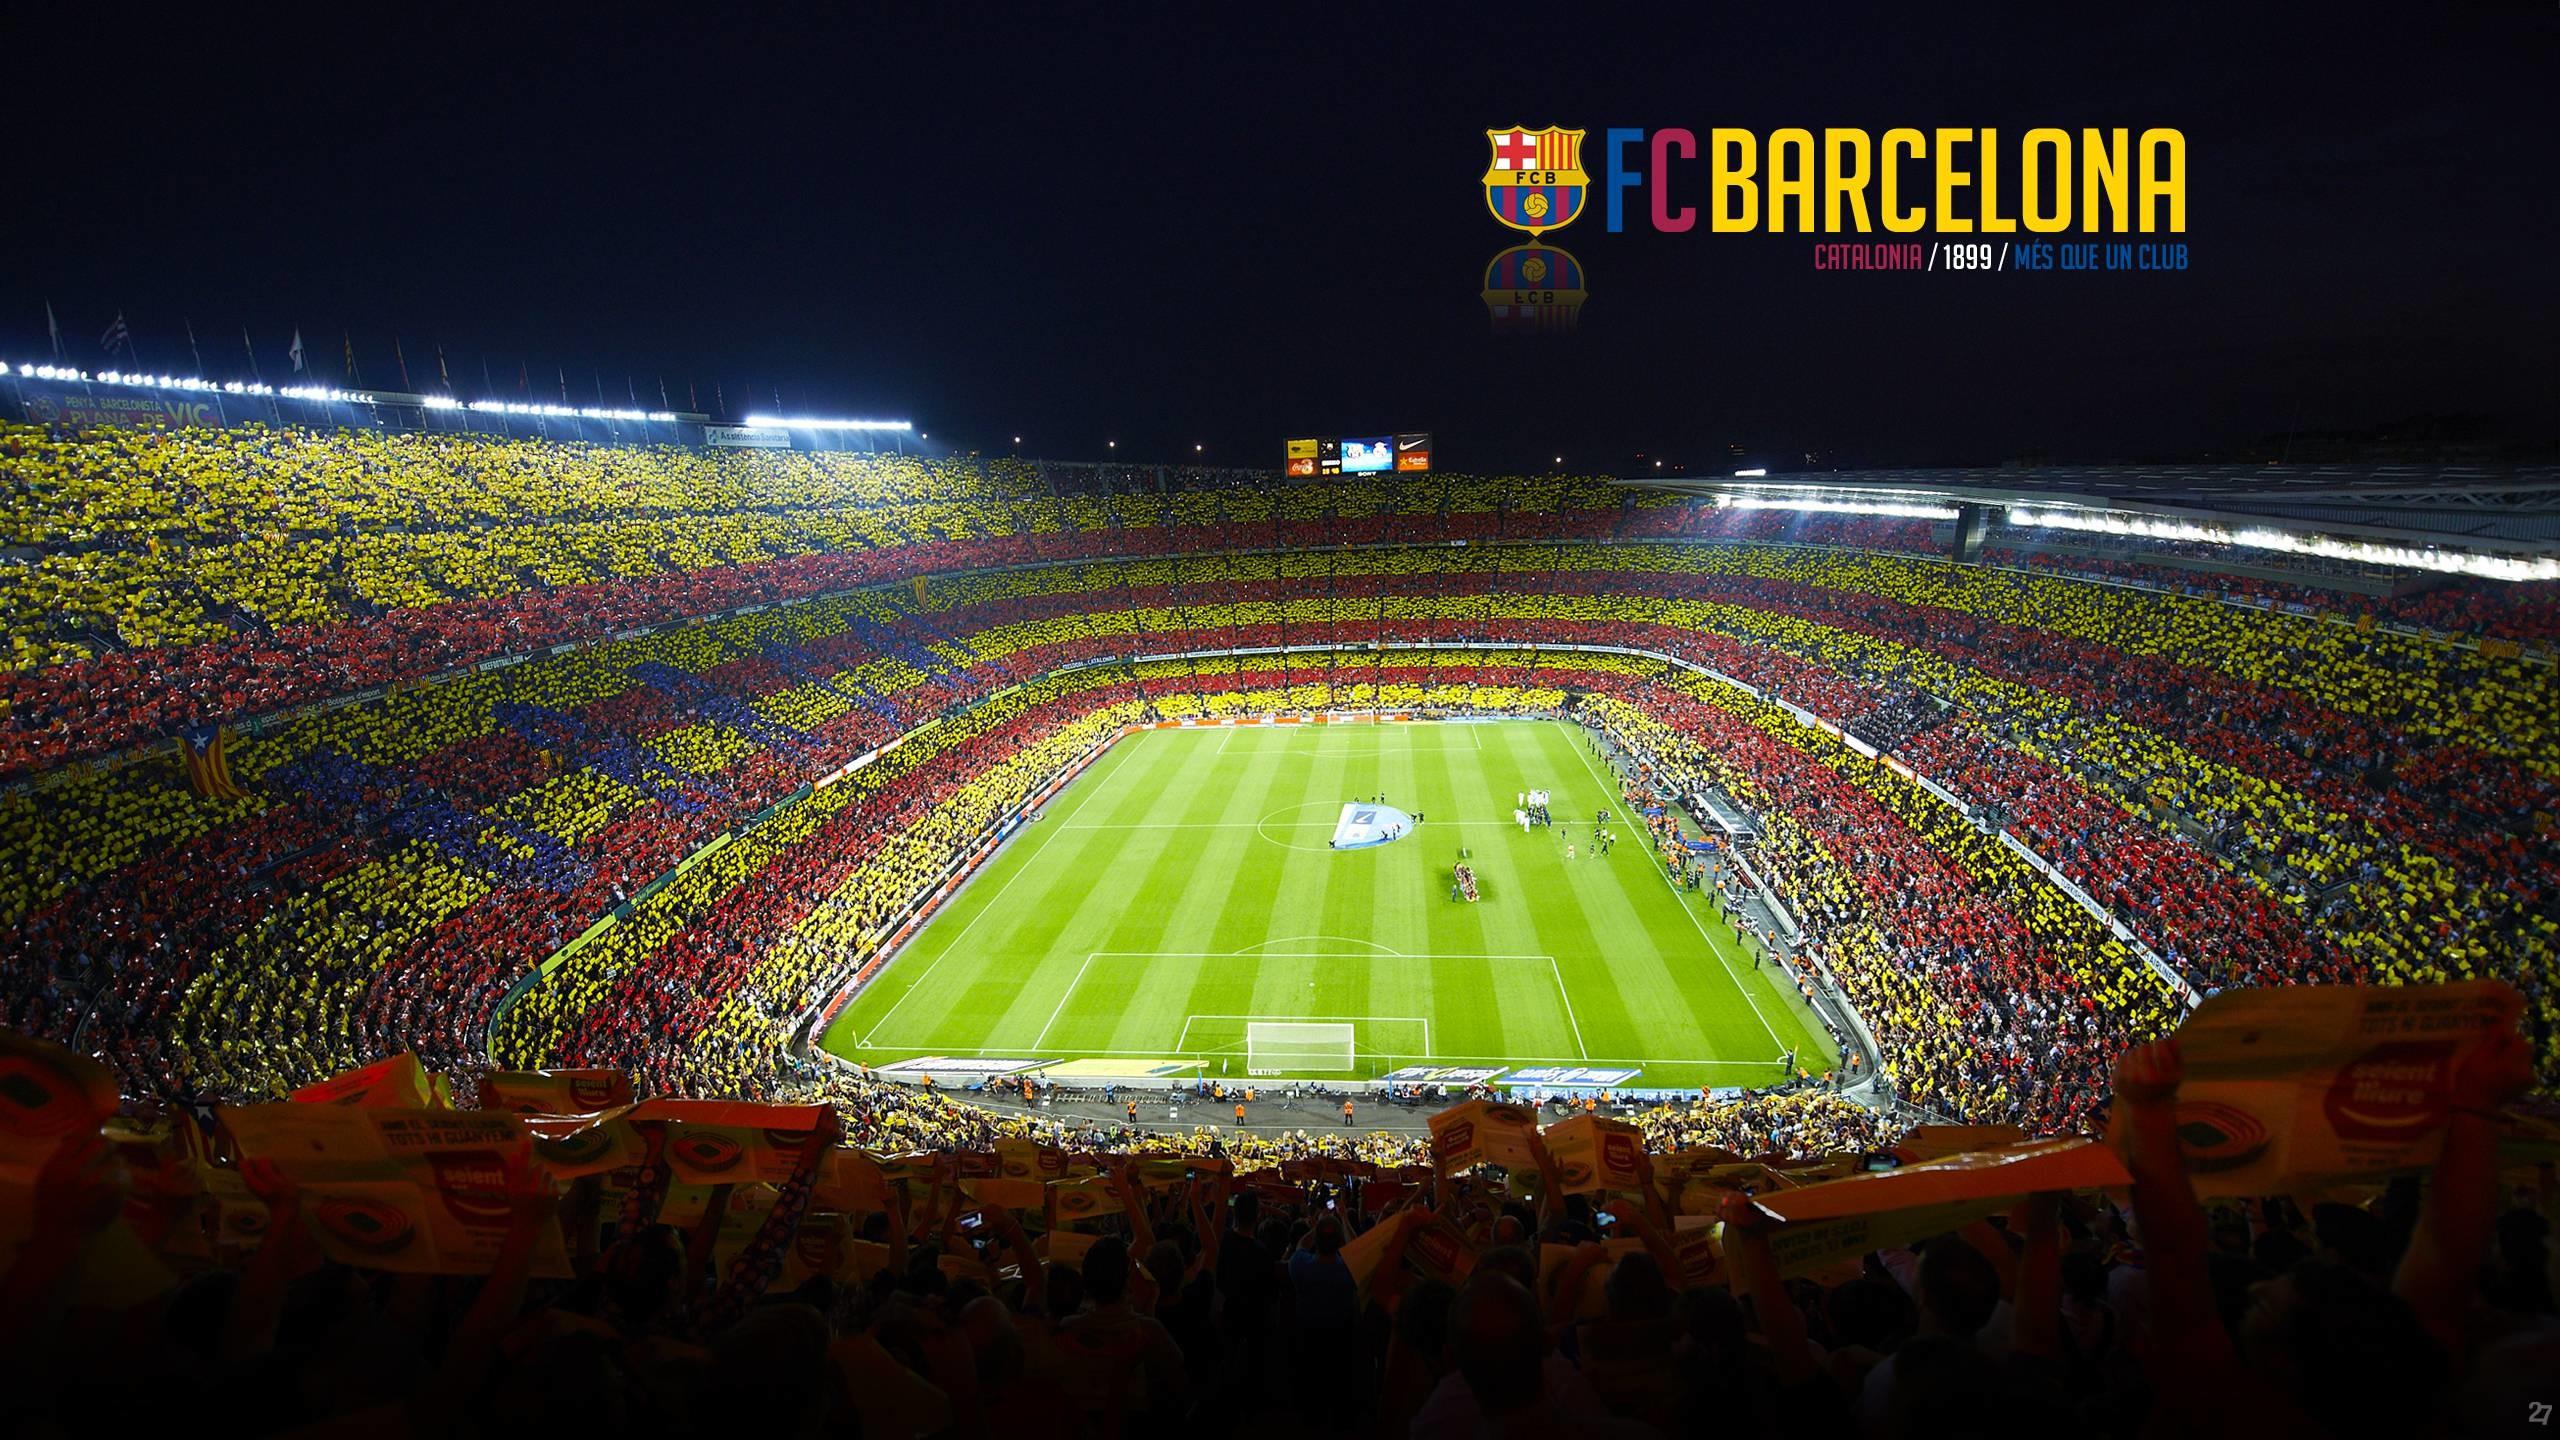 Fc Barcelona Camp Nou Soccer Clubs Soccer Wallpapers Hd: Fc Barcelona Wallpaper HD 2018 (68+ Images